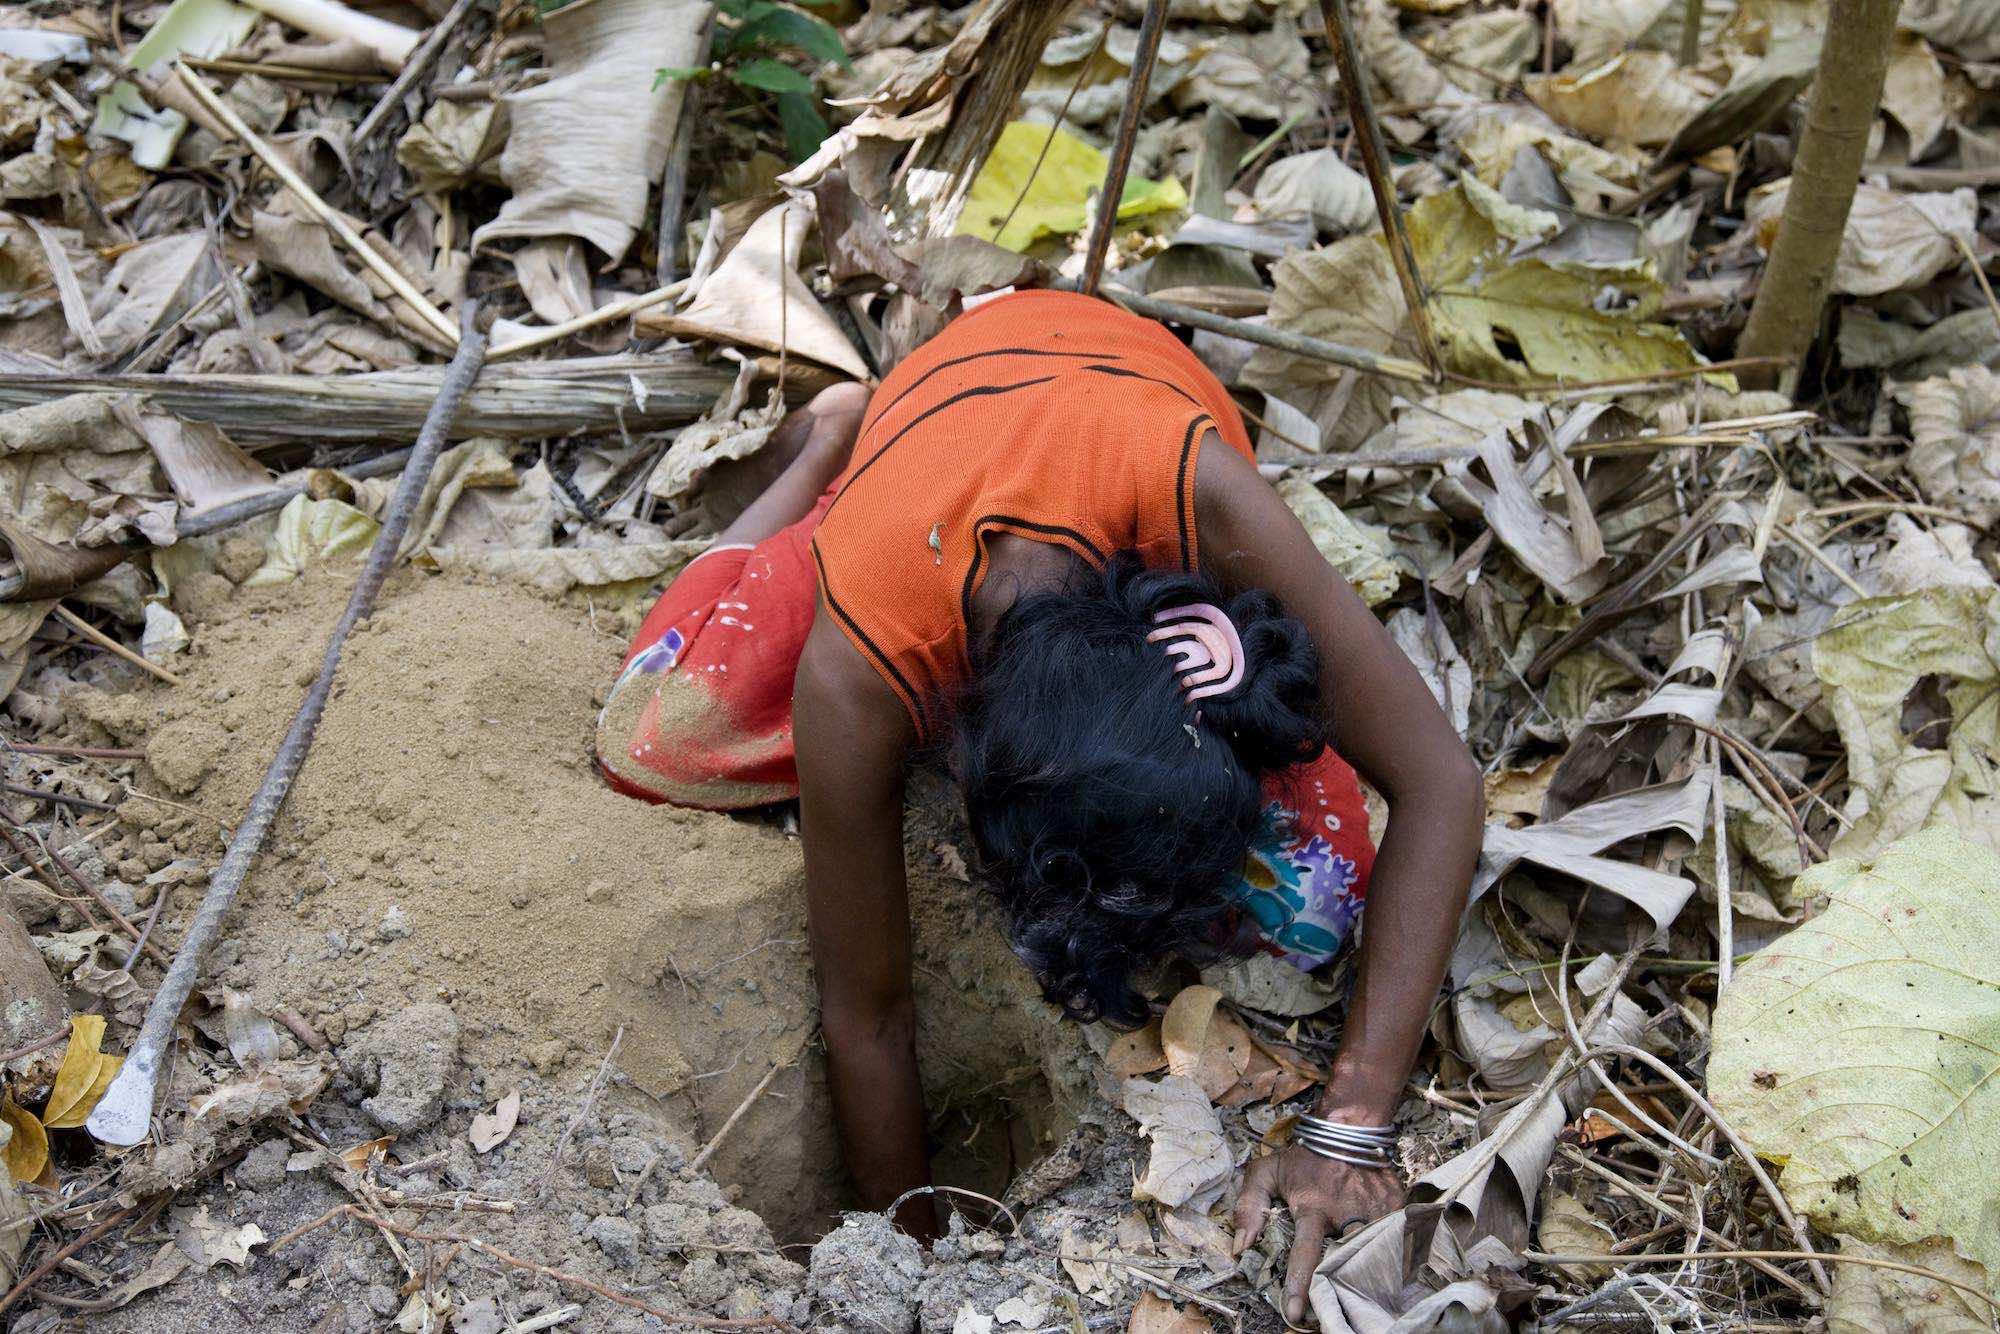 35.Sabai trepanned for wild yams in the rainforested Island.jpeg